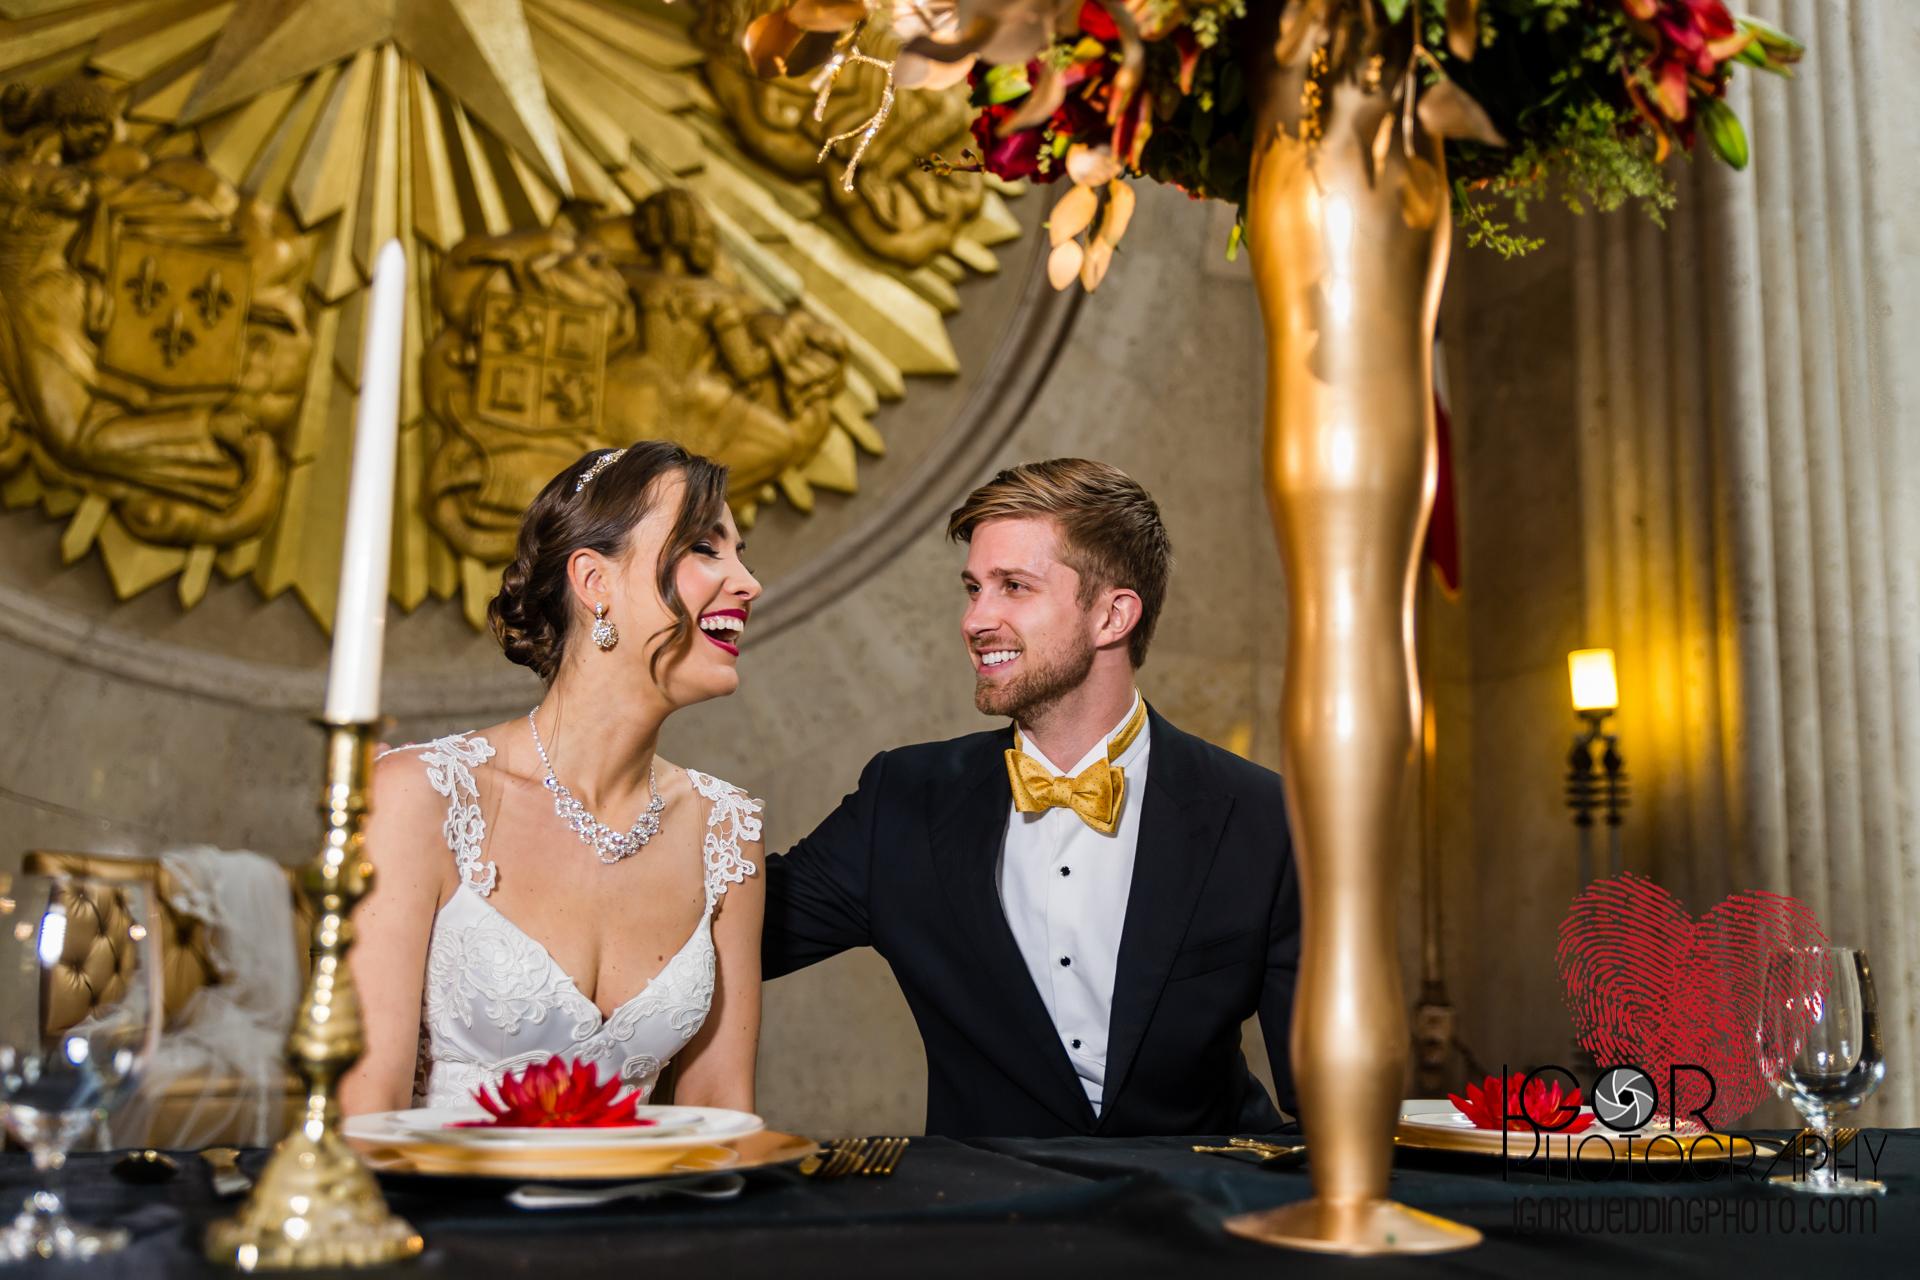 HOS candid wedding reception photo